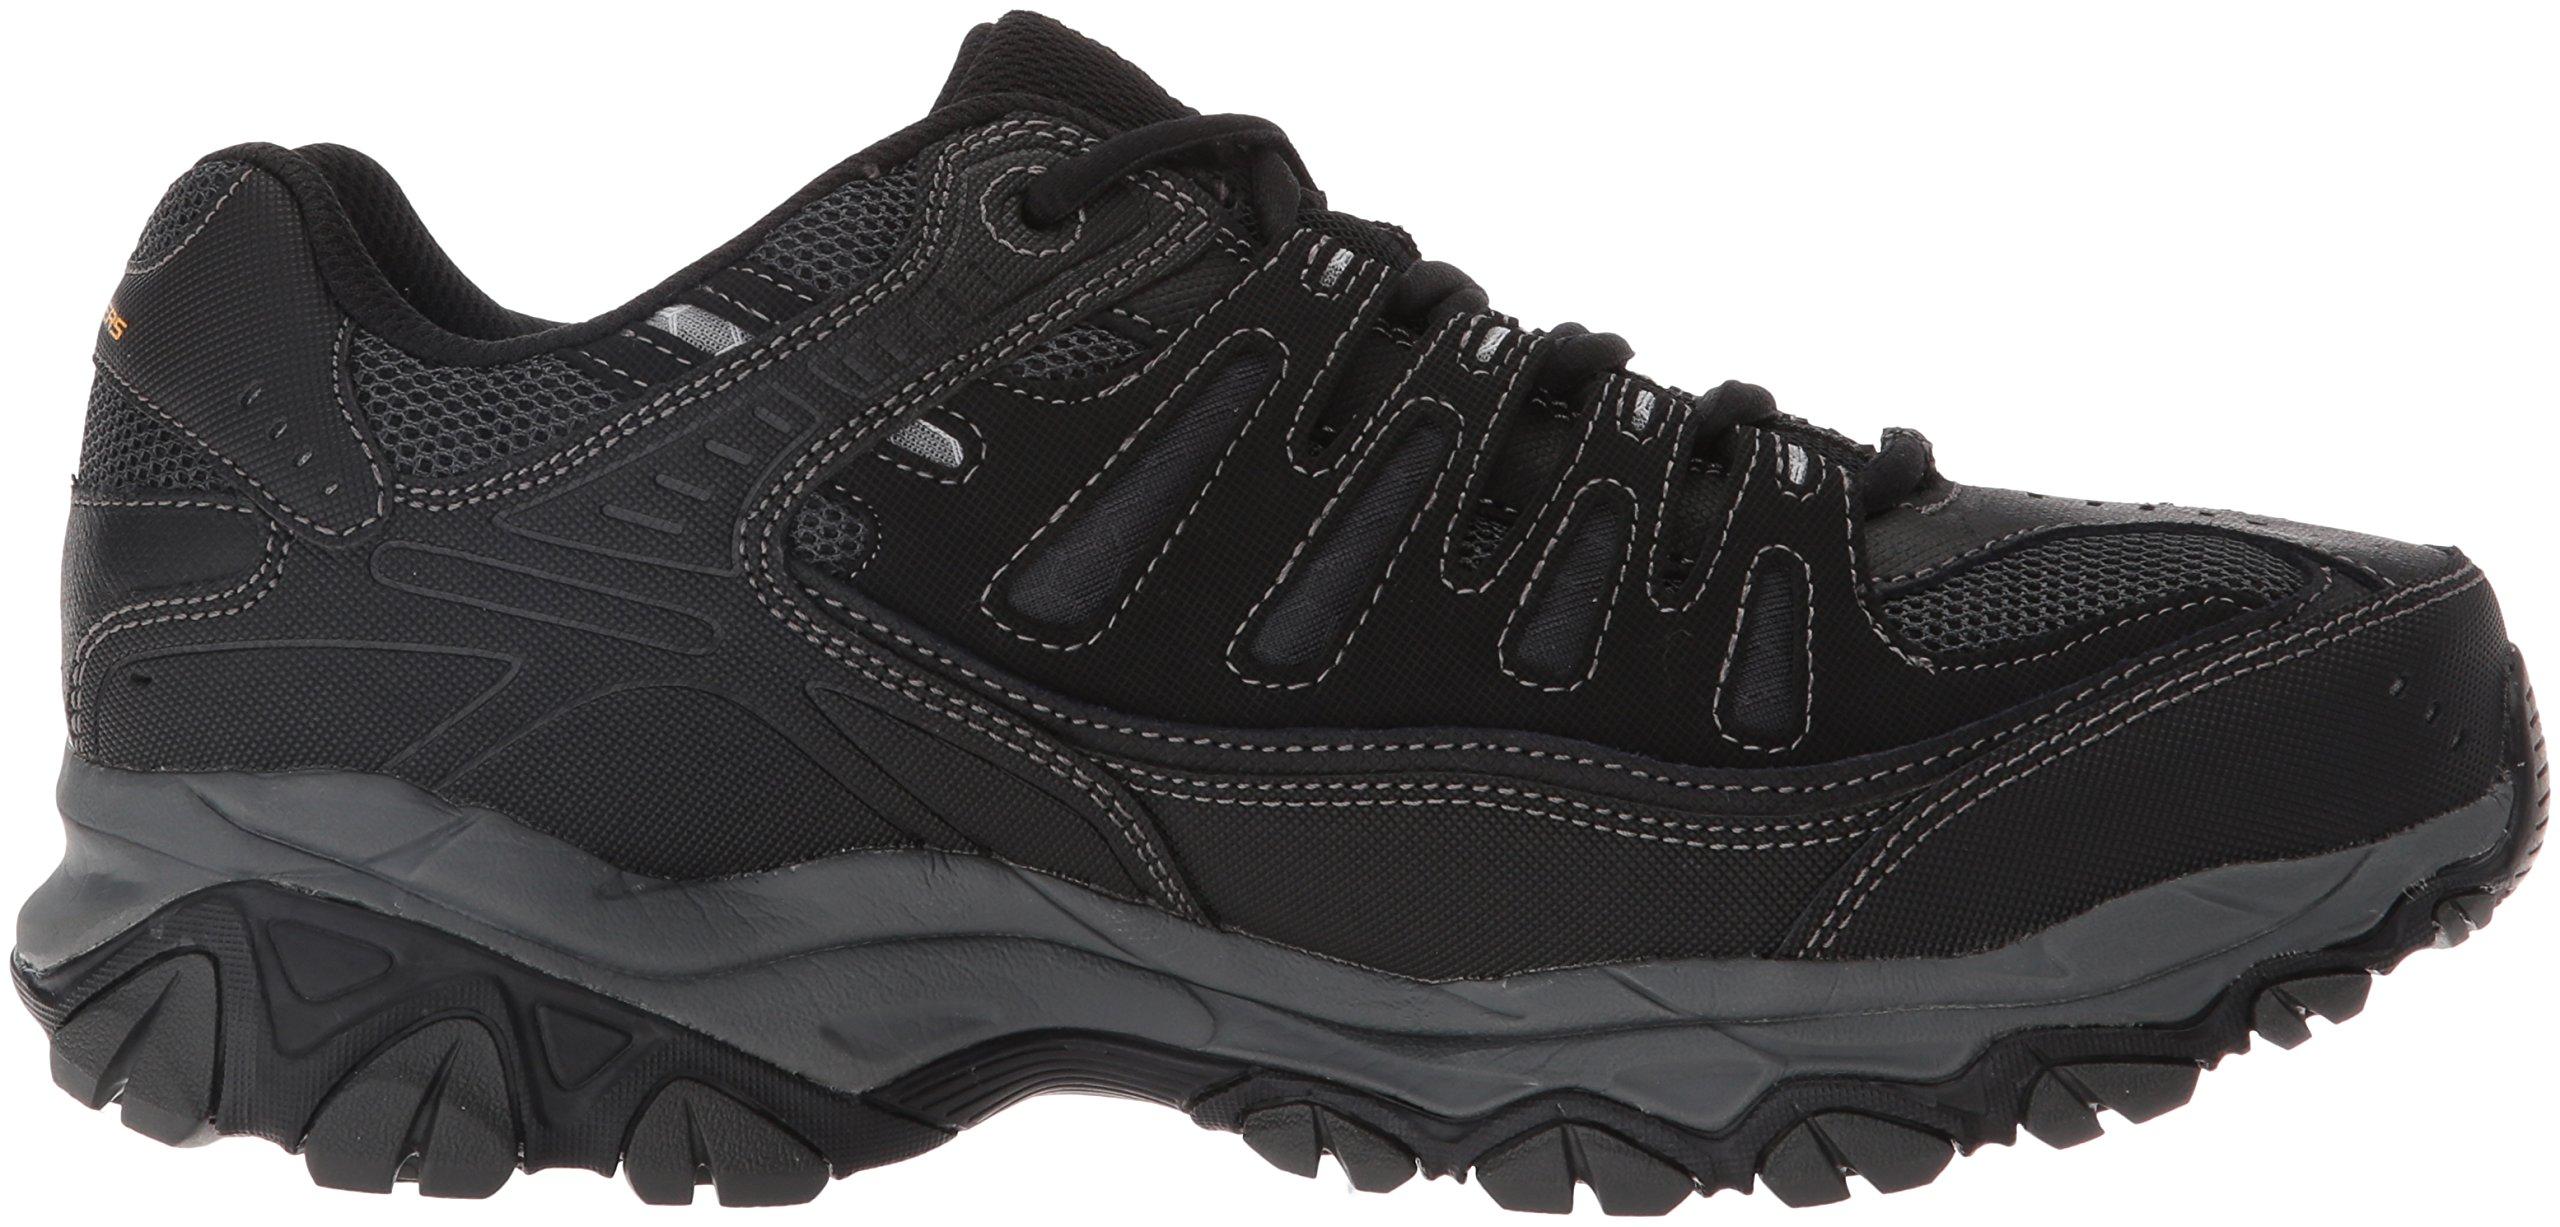 Skechers Men's AFTERBURNM.FIT Memory Foam Lace-Up Sneaker, Black, 6.5 M US by Skechers (Image #7)